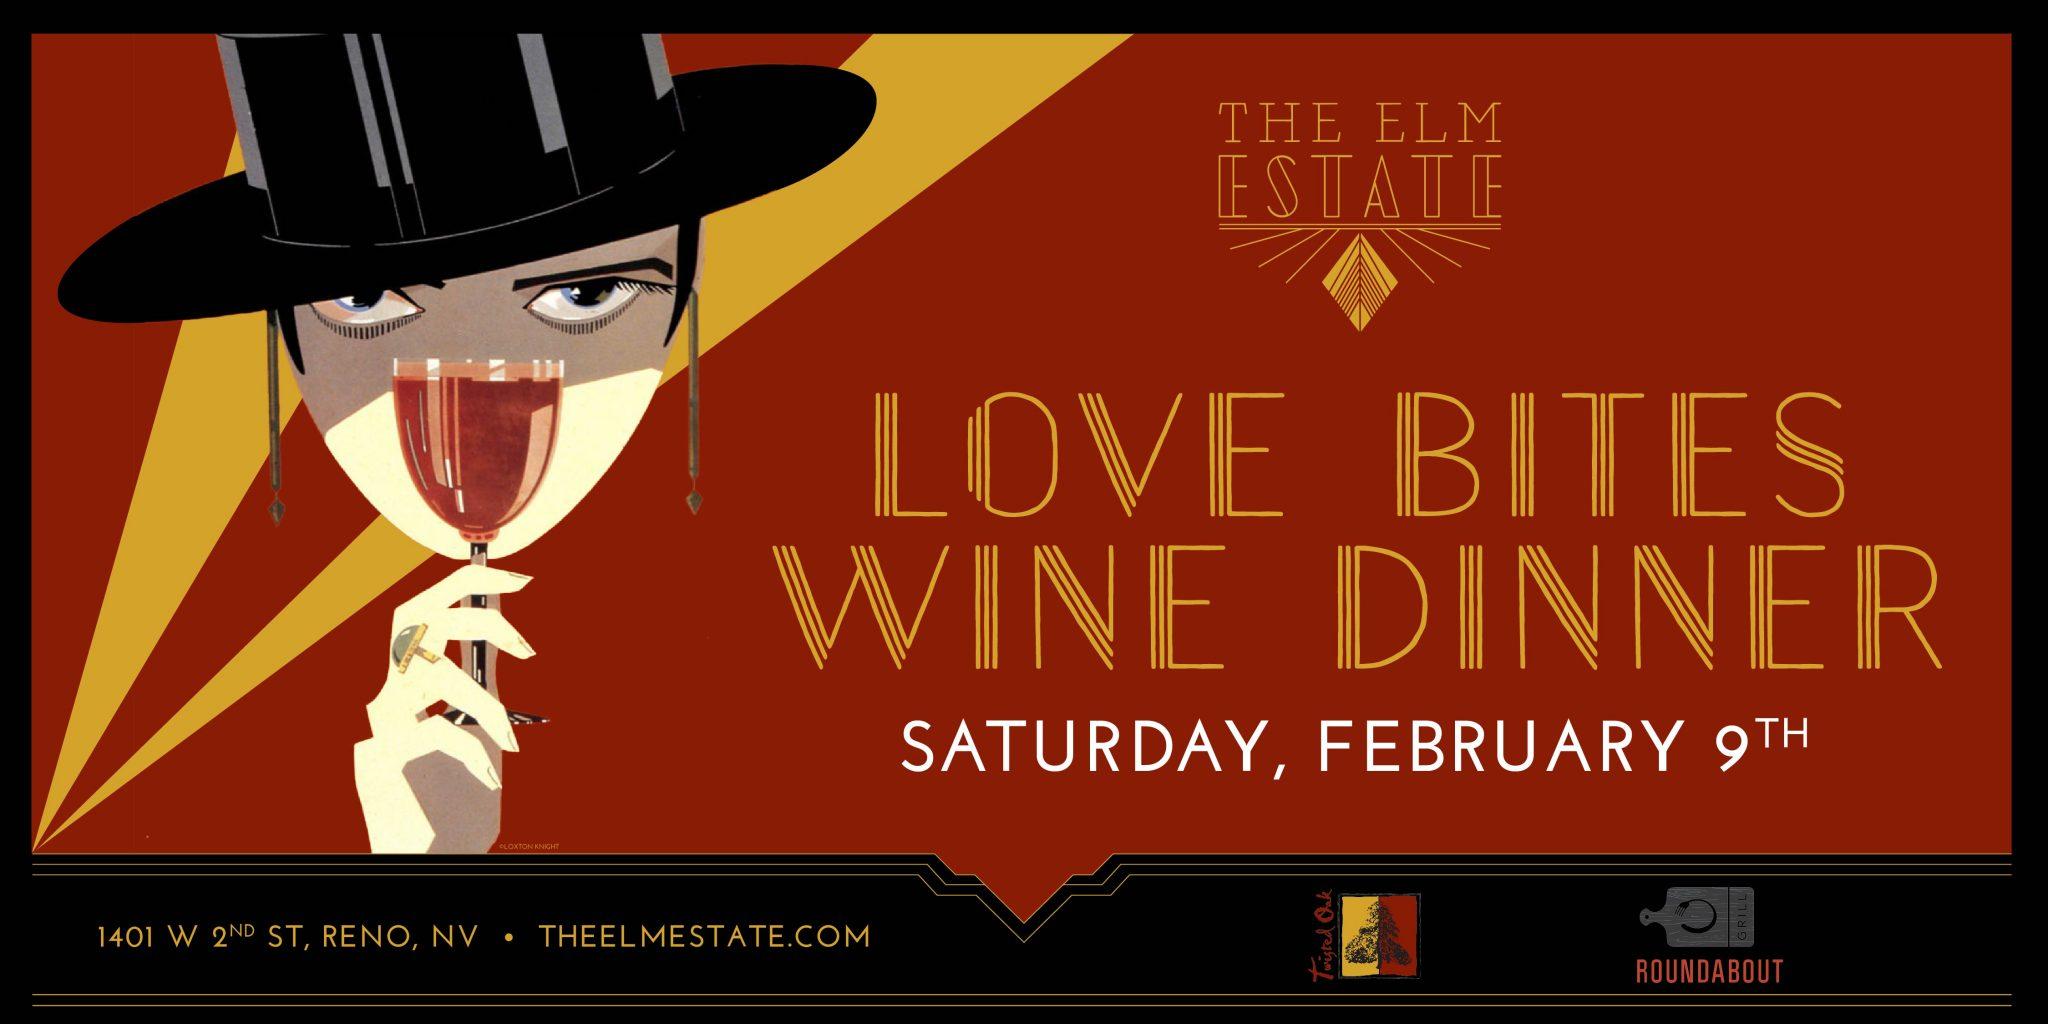 Love Bites – so let's just drink some wine!